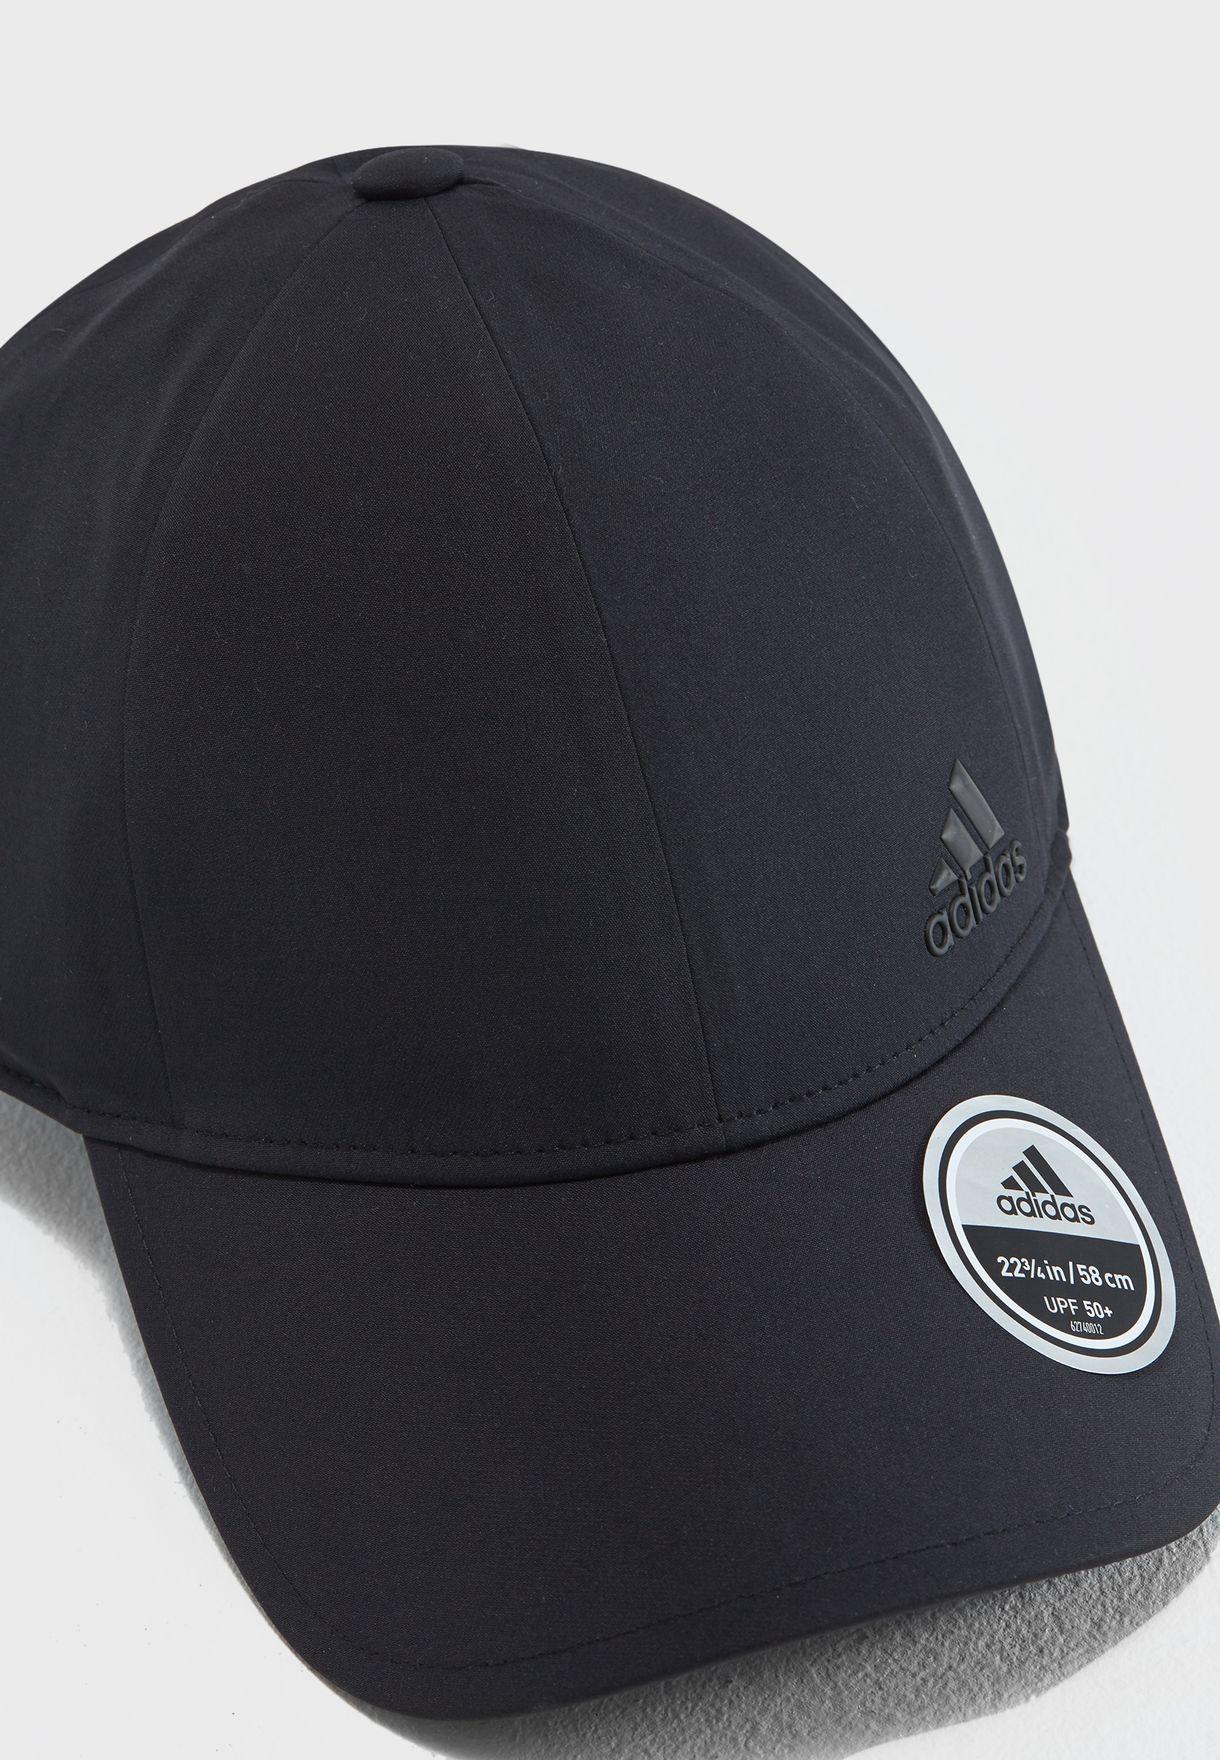 812d168cfb7 Shop adidas black Bonded Logo Cap S97588 for Men in UAE - AD476AC94SMF